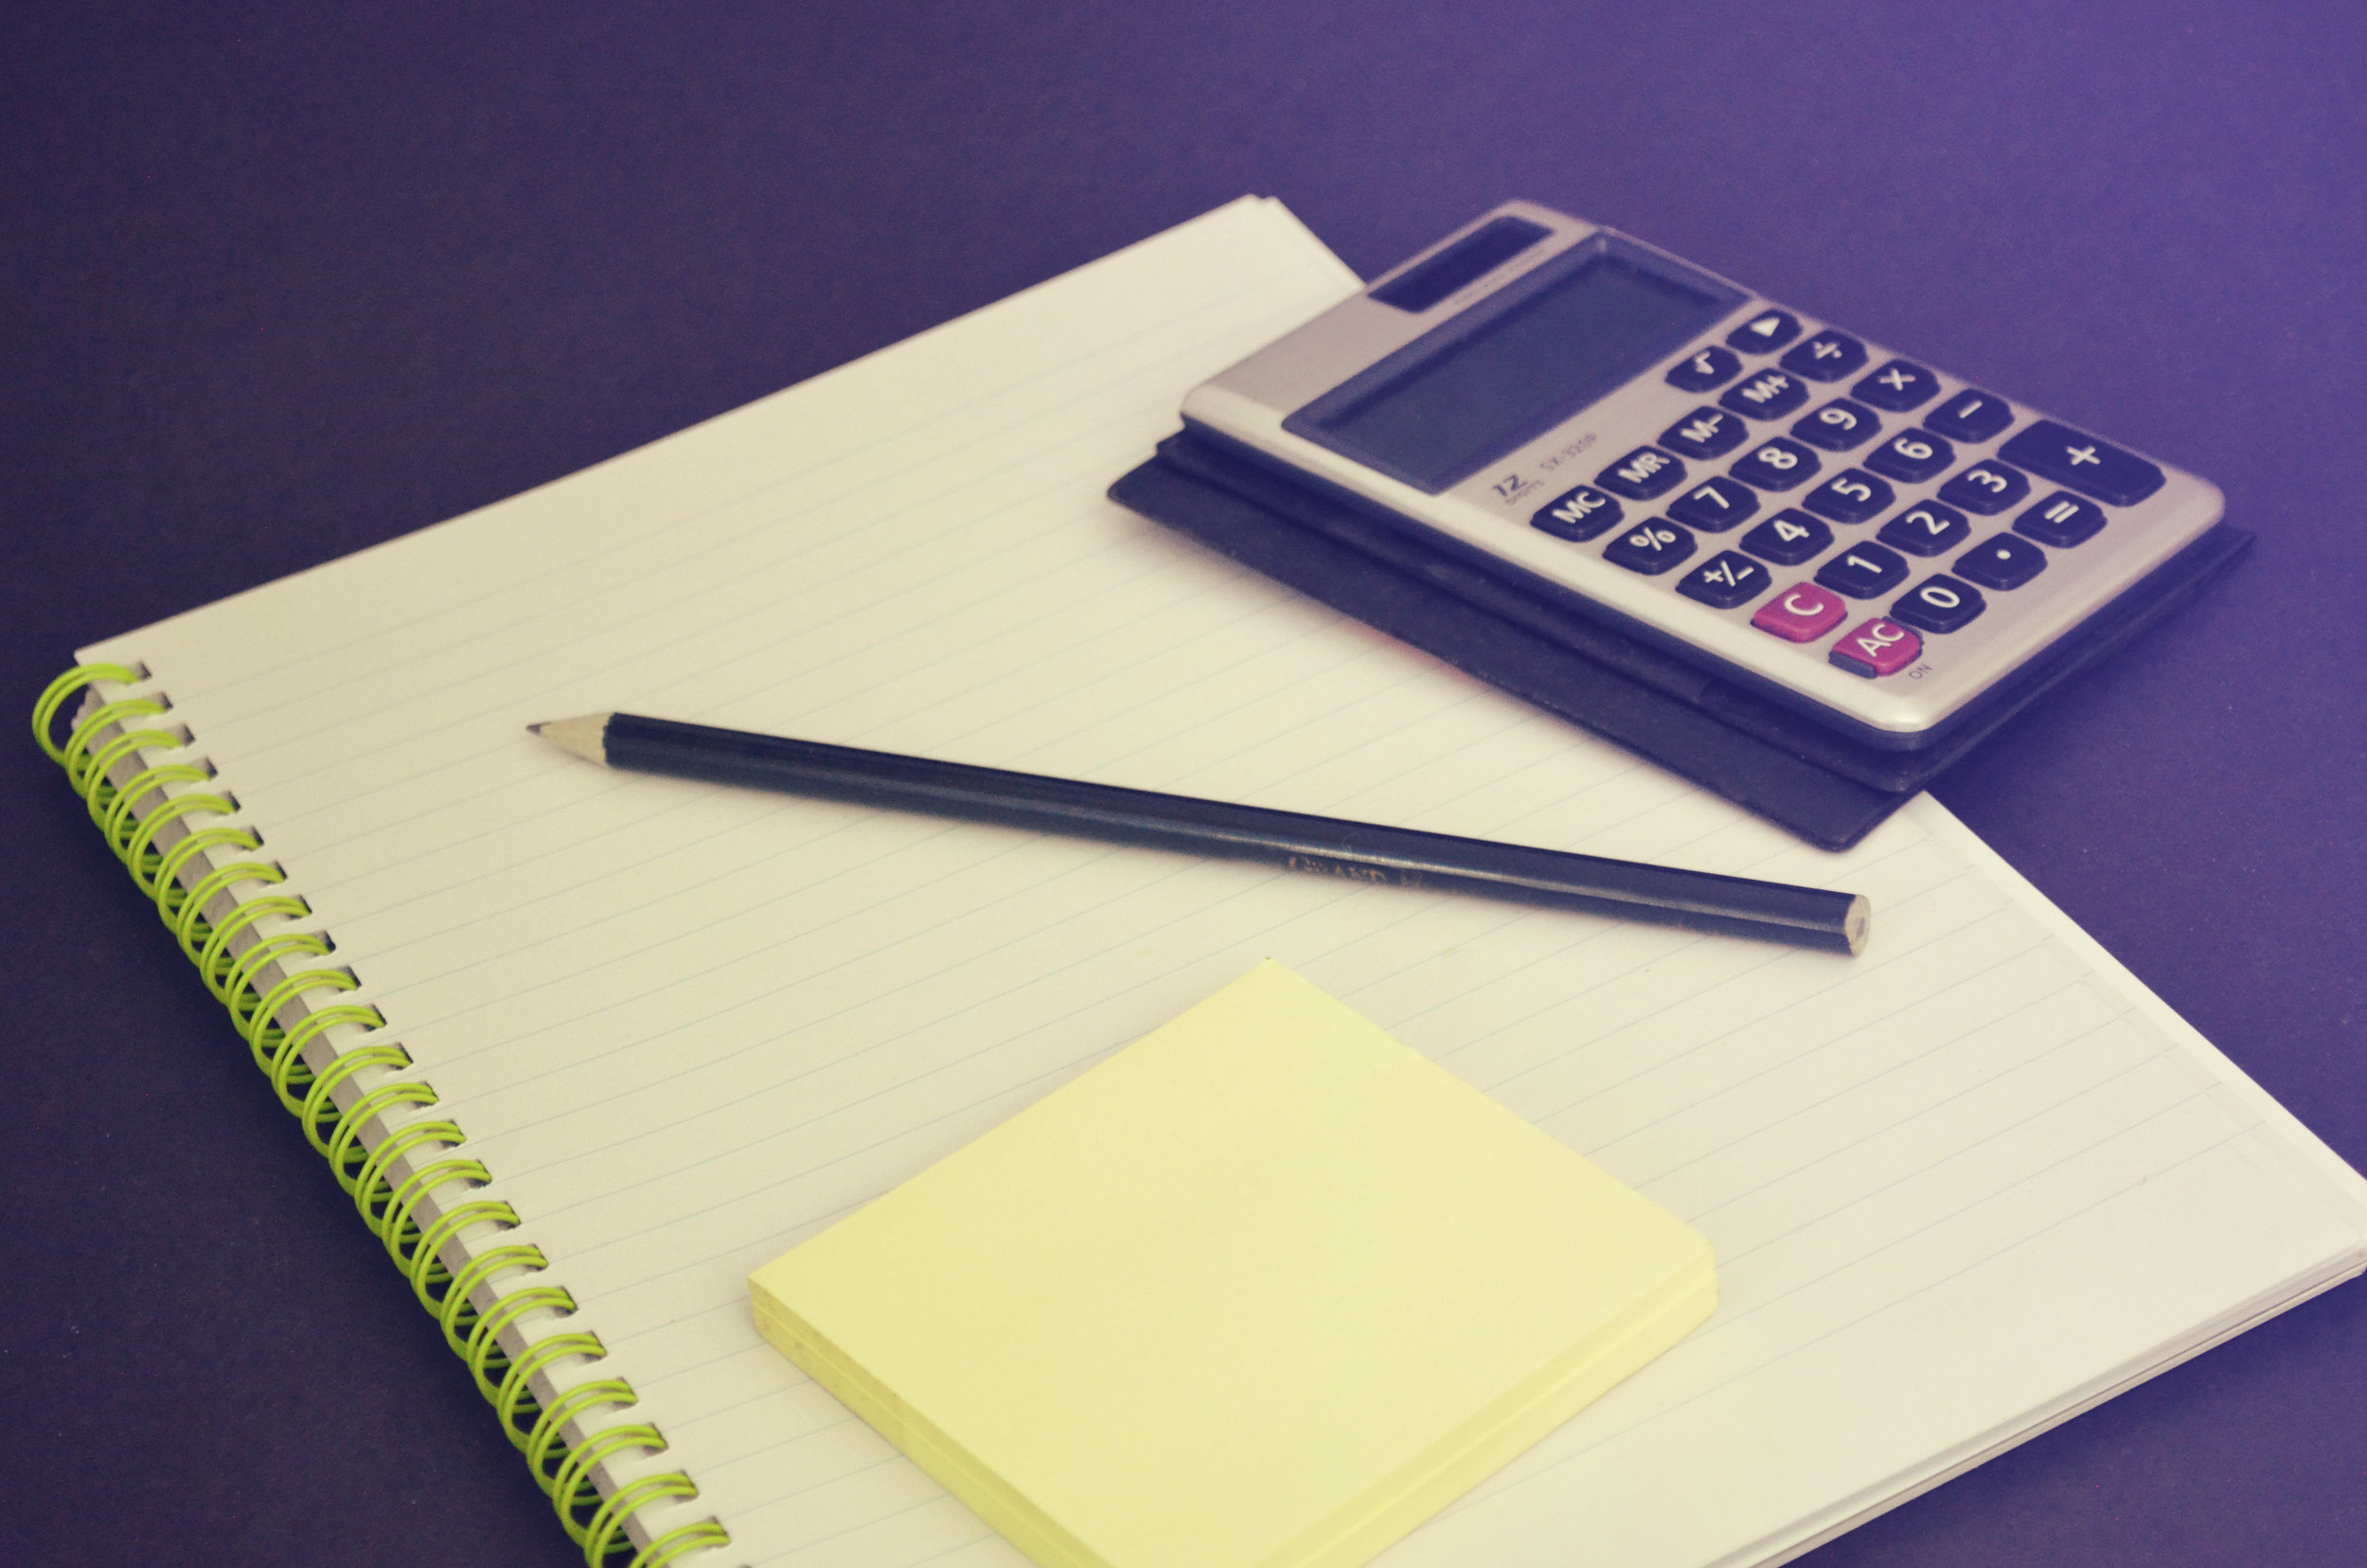 notepad_pencil3_hires.JPG